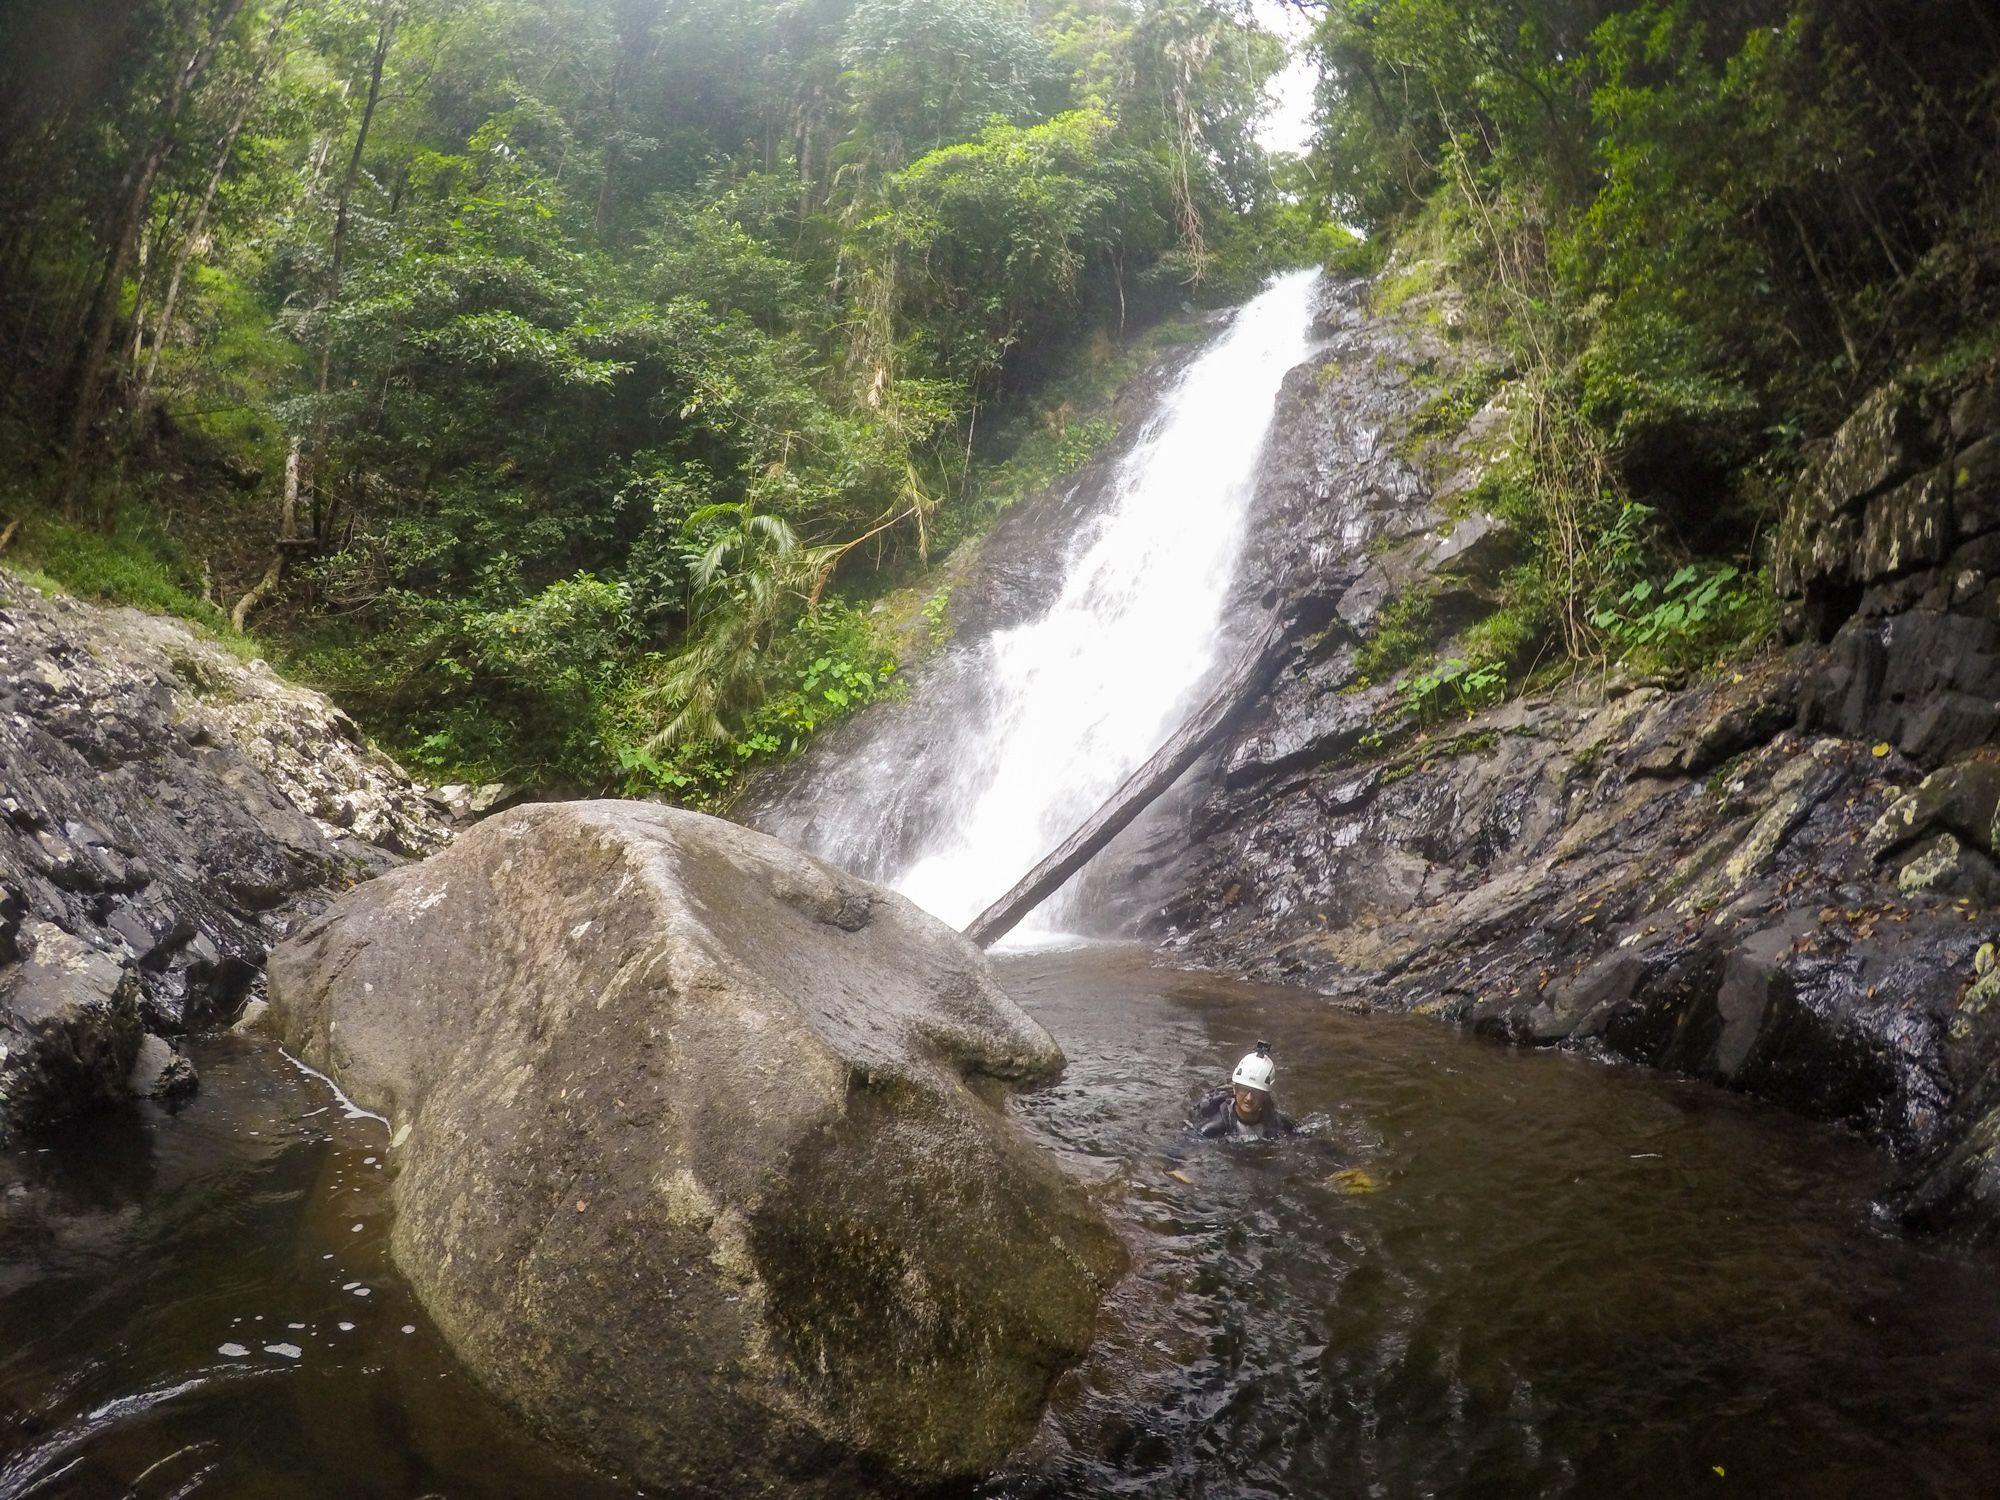 false falls